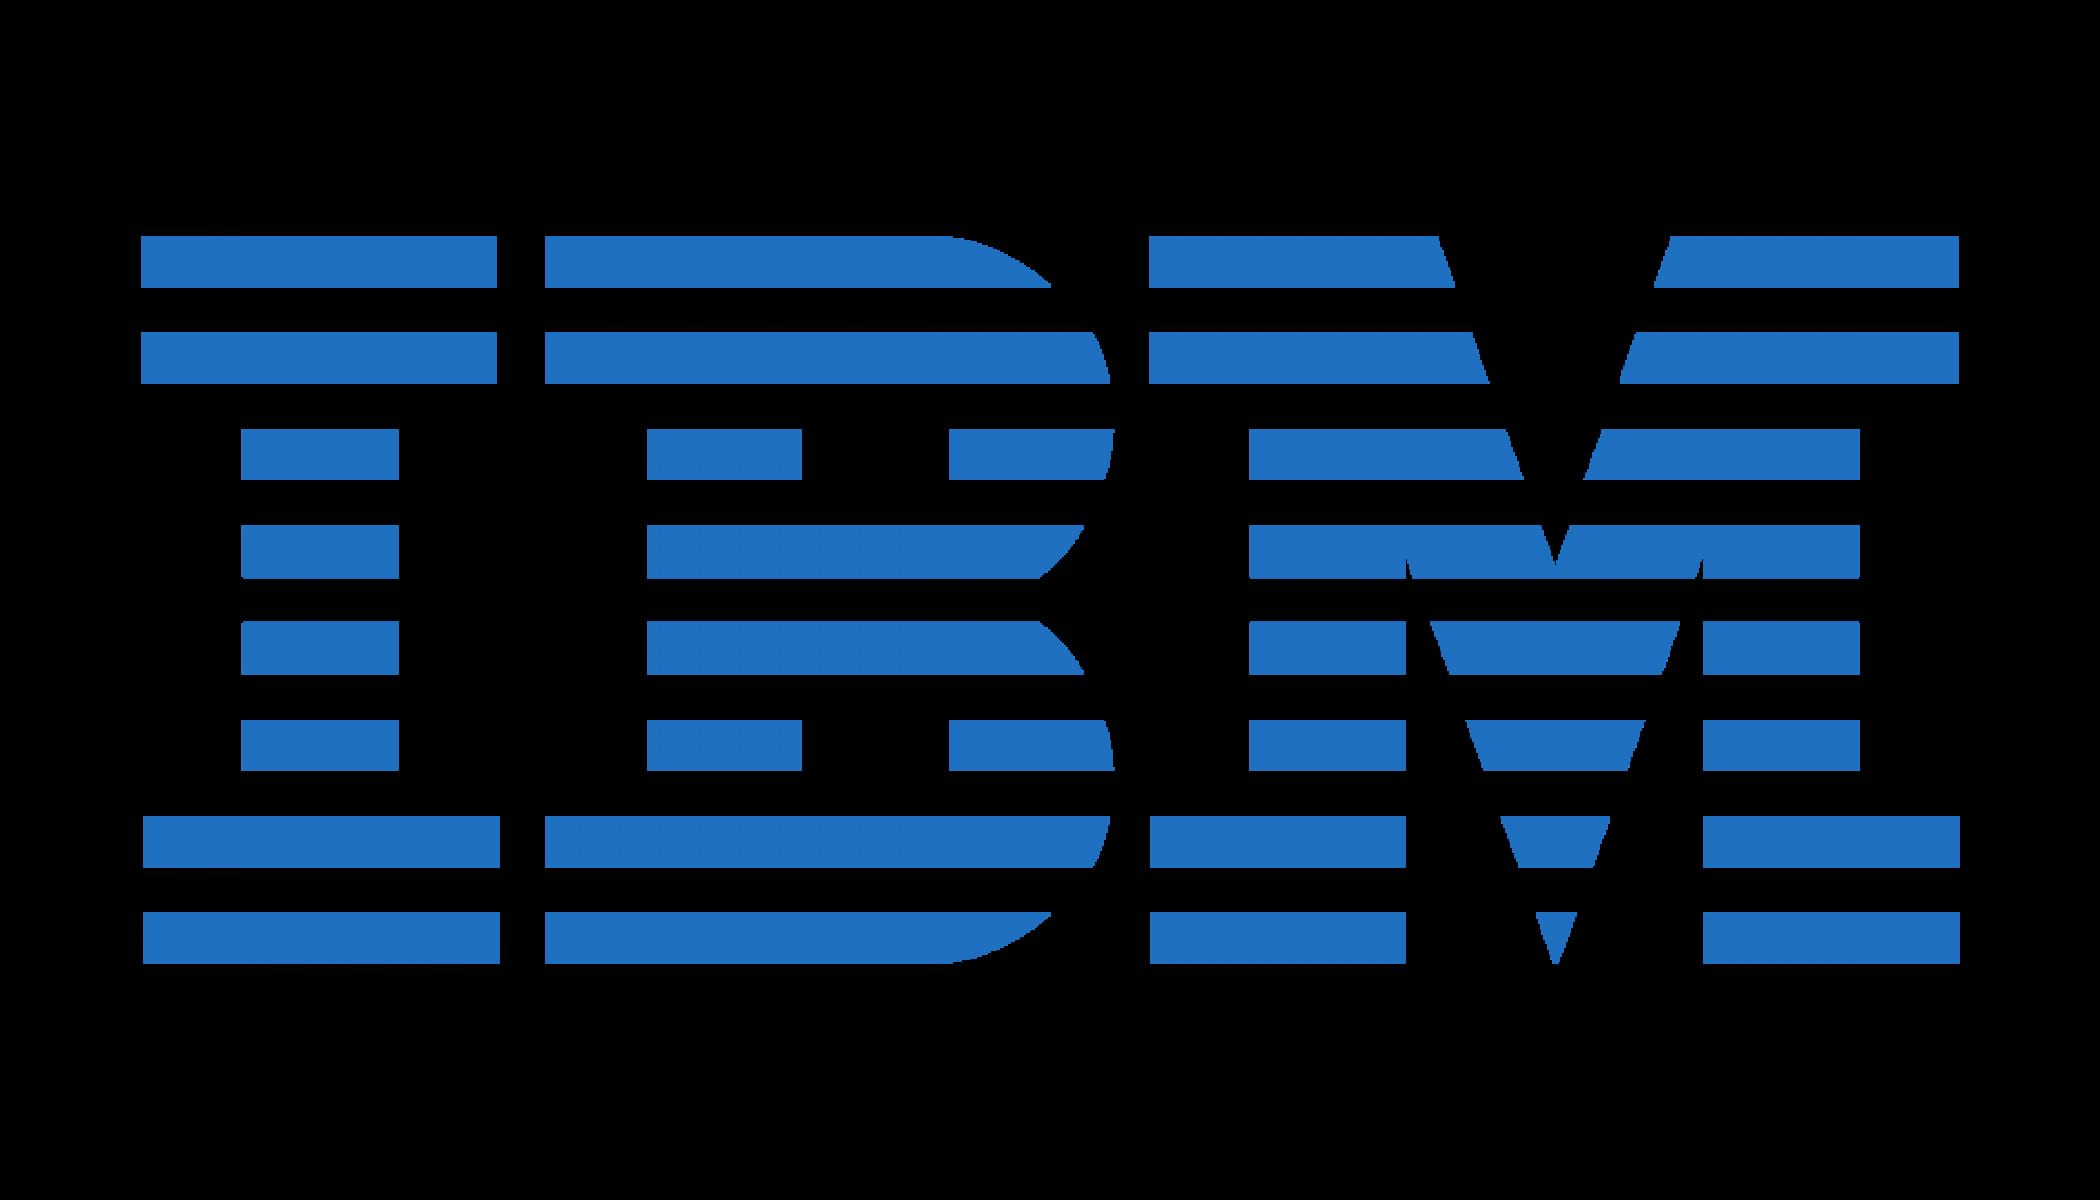 Blockchain encabeza el grupo de patentes de IBM - Blockchain Economía